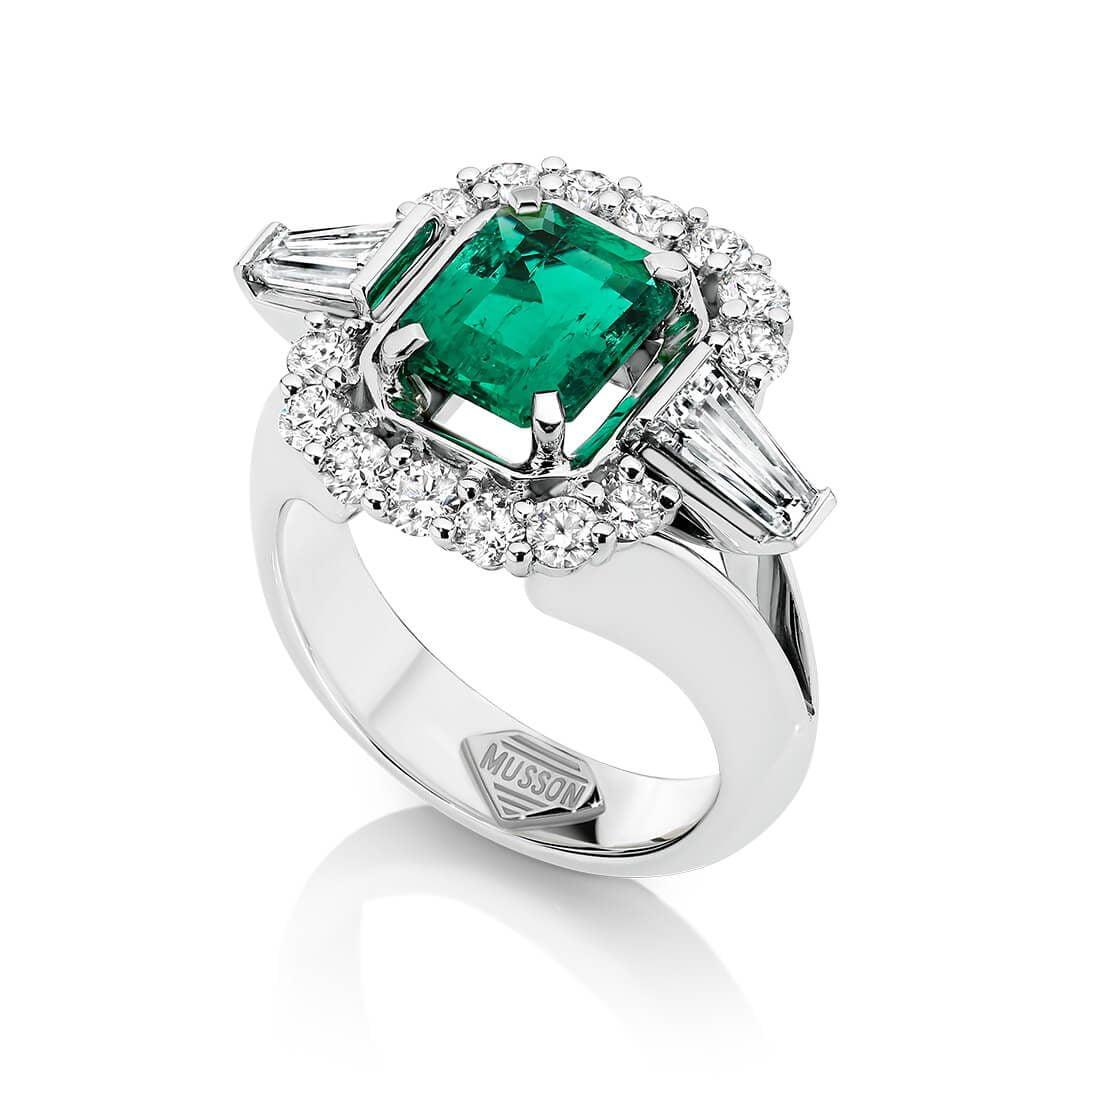 Juliette Ring, Emerald